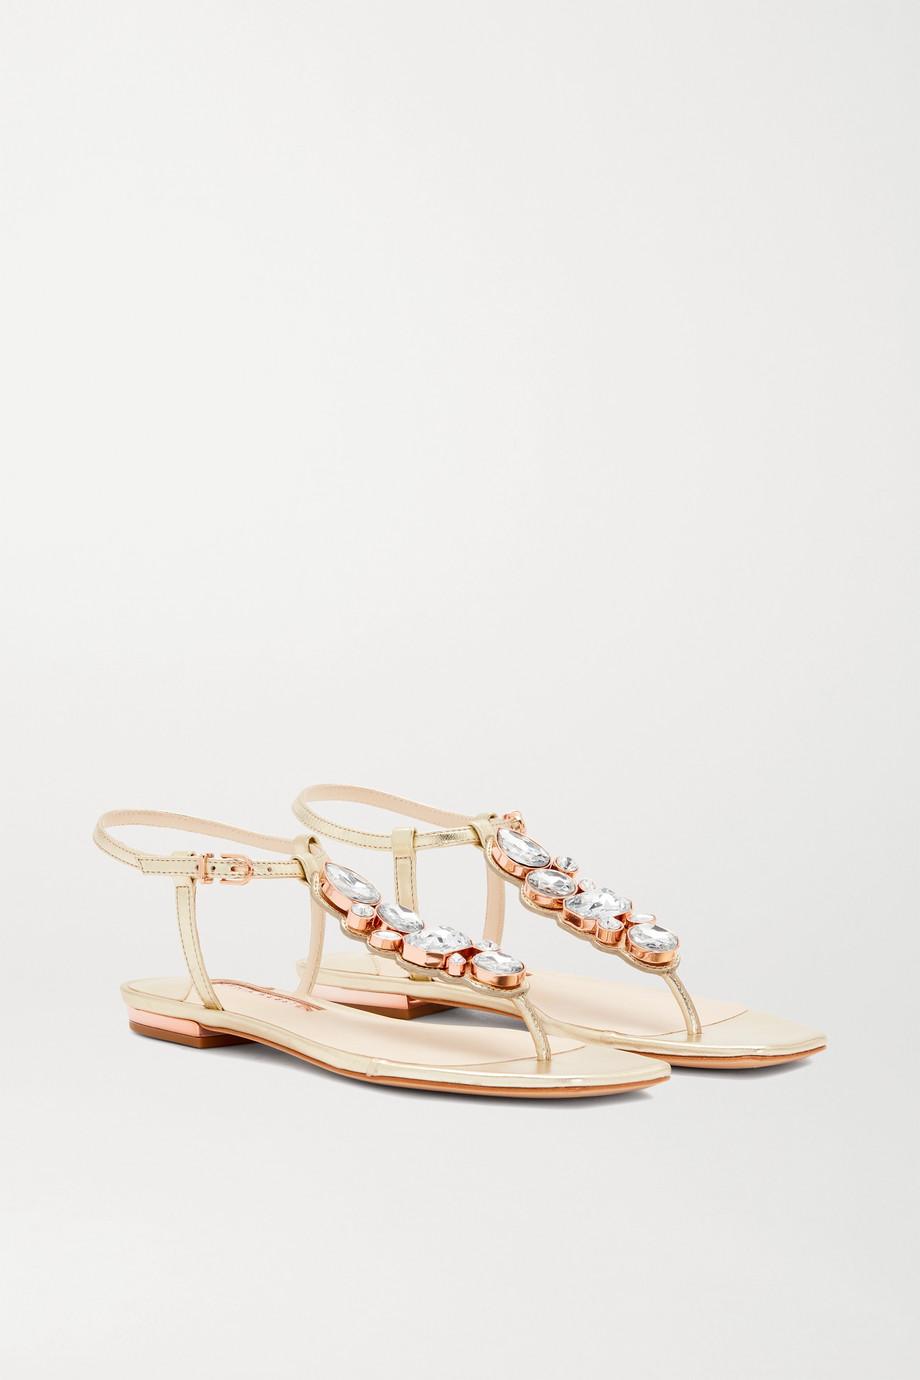 Sophia Webster Ritzy crystal-embellished metallic leather sandals